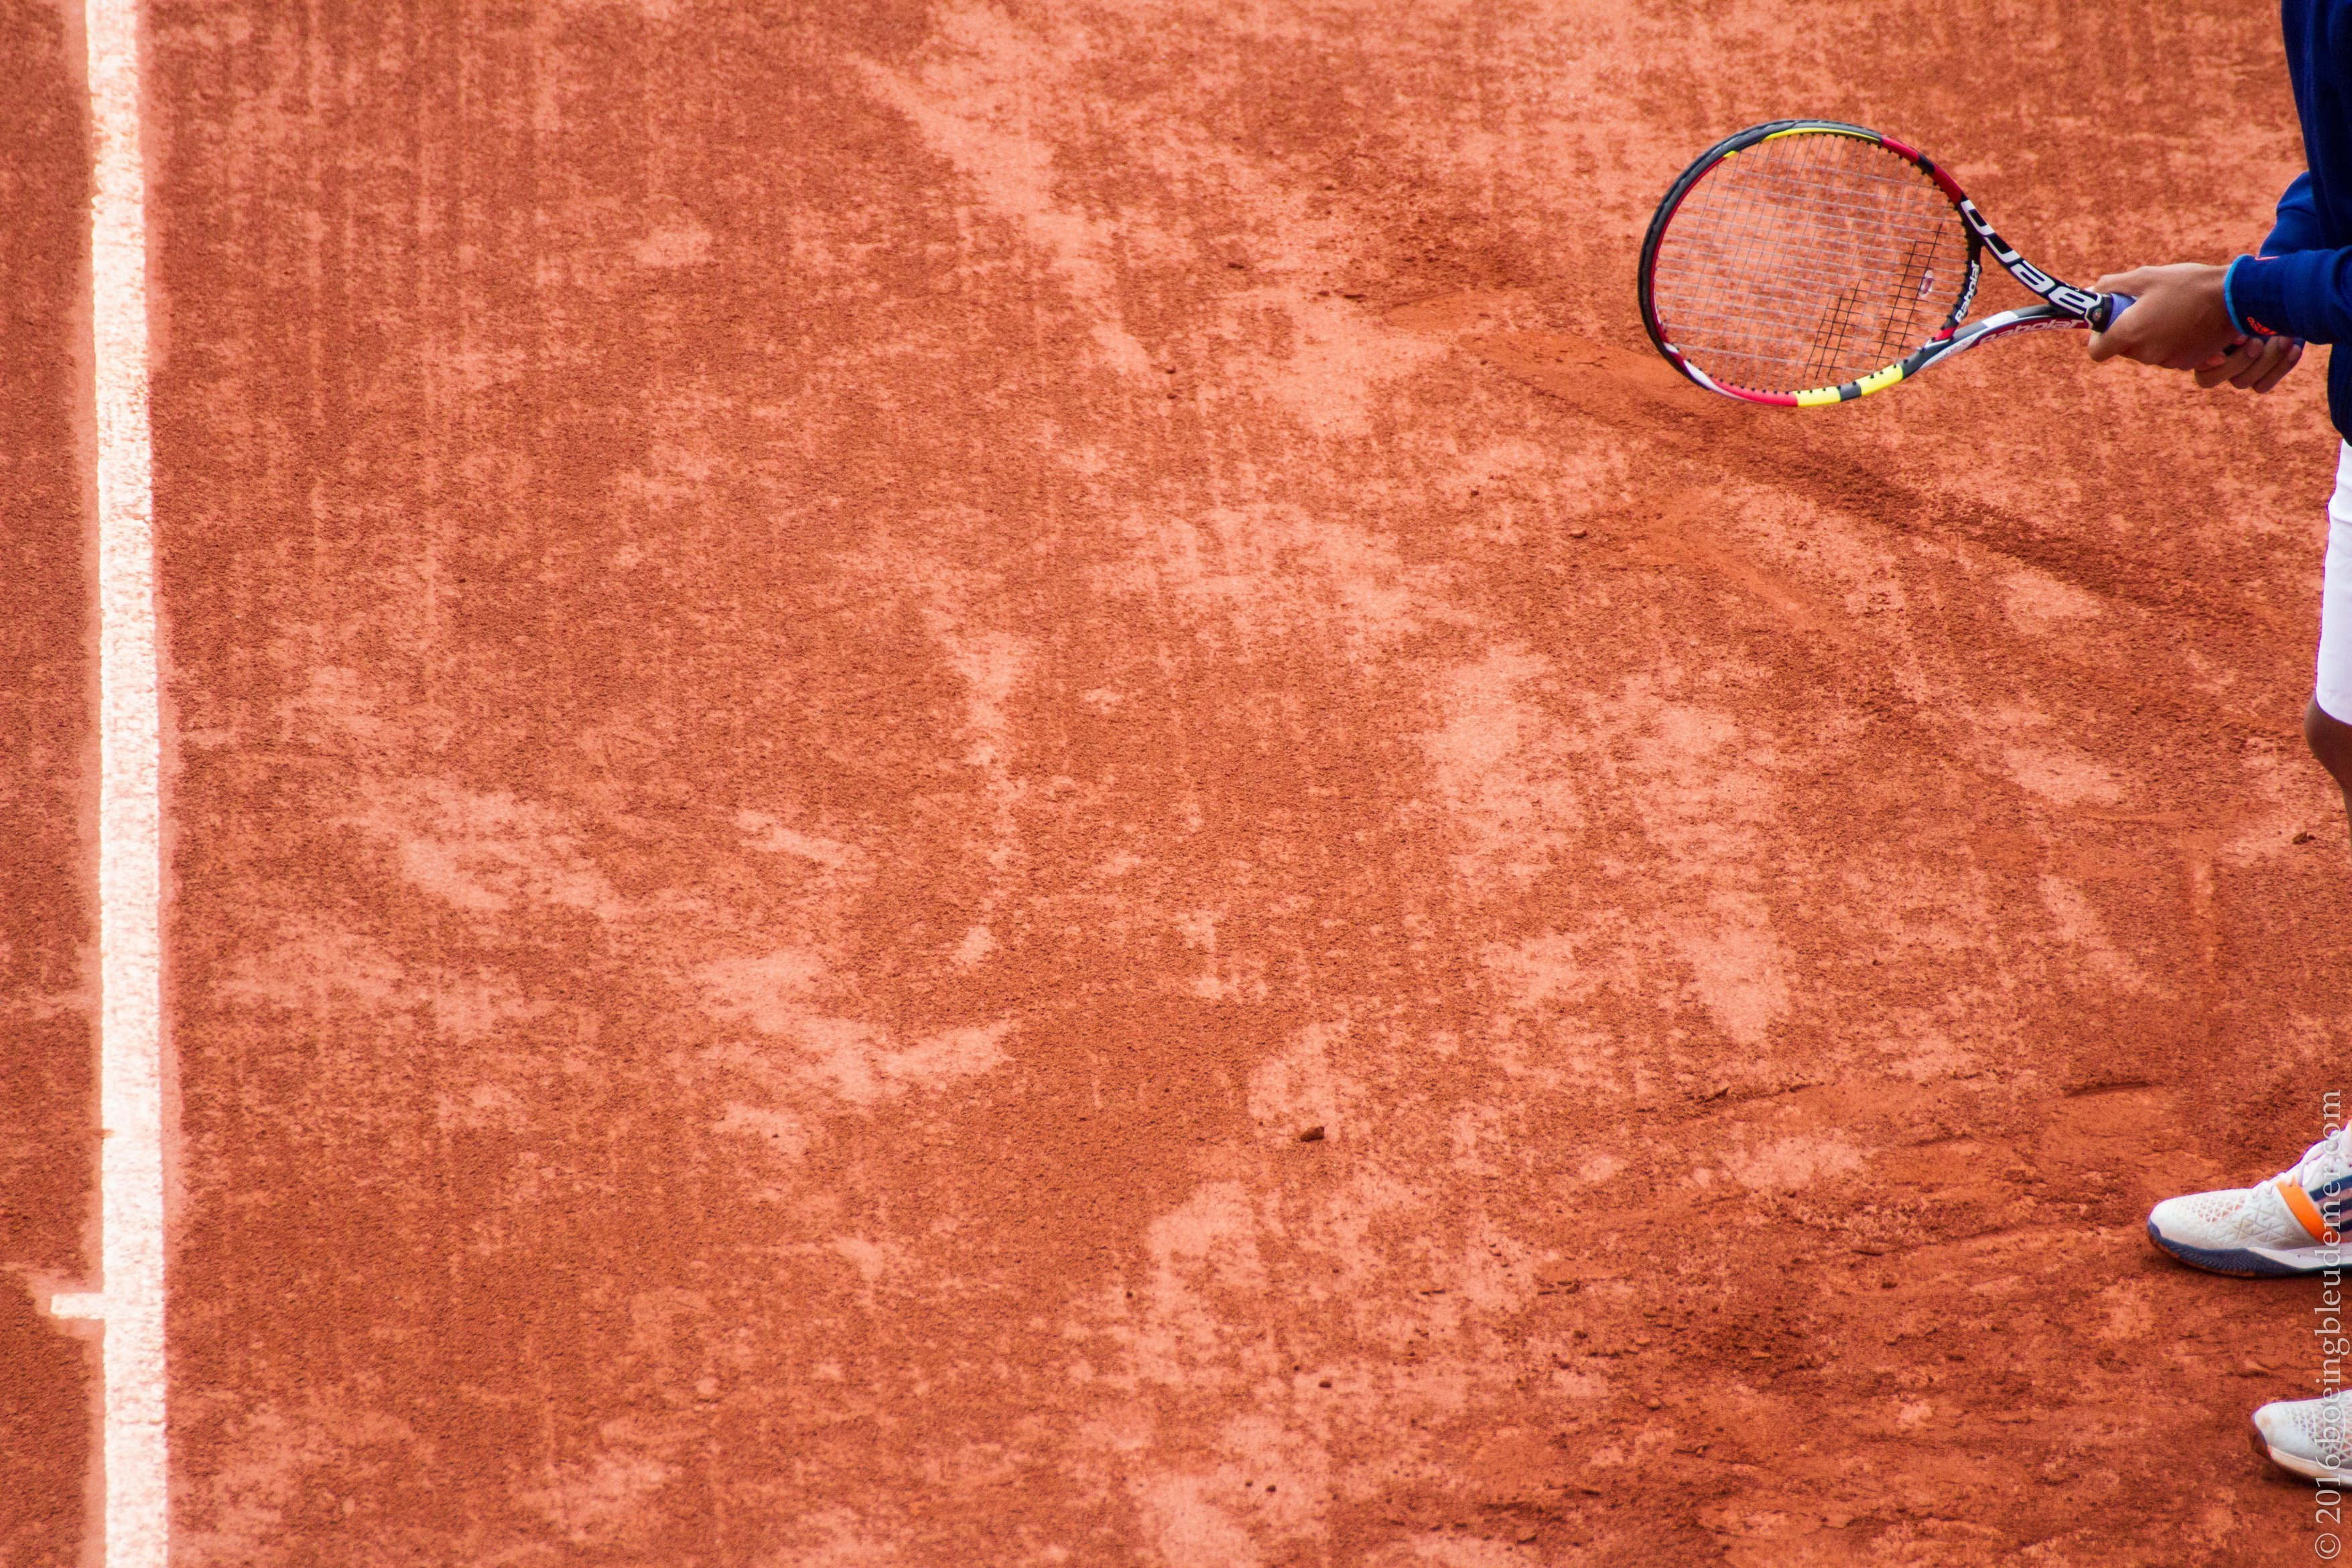 Roland Garros: Tennis sur terre battue